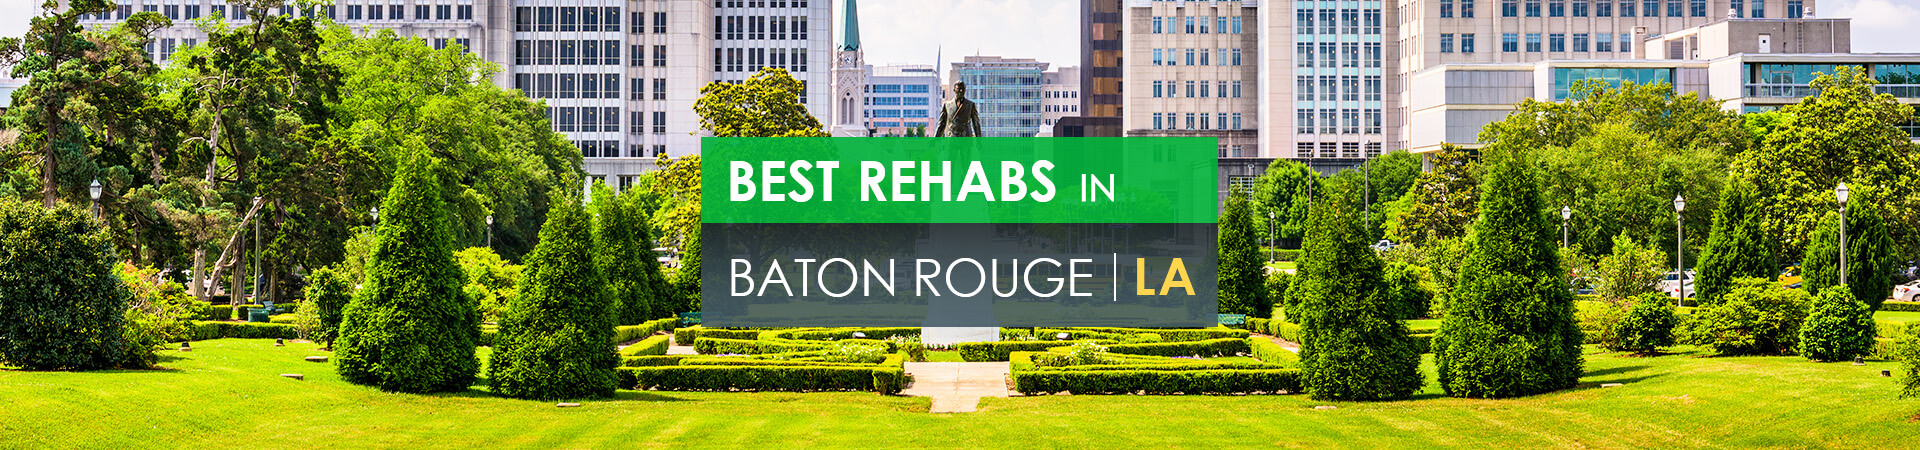 Best rehabs in Baton Rouge, LA